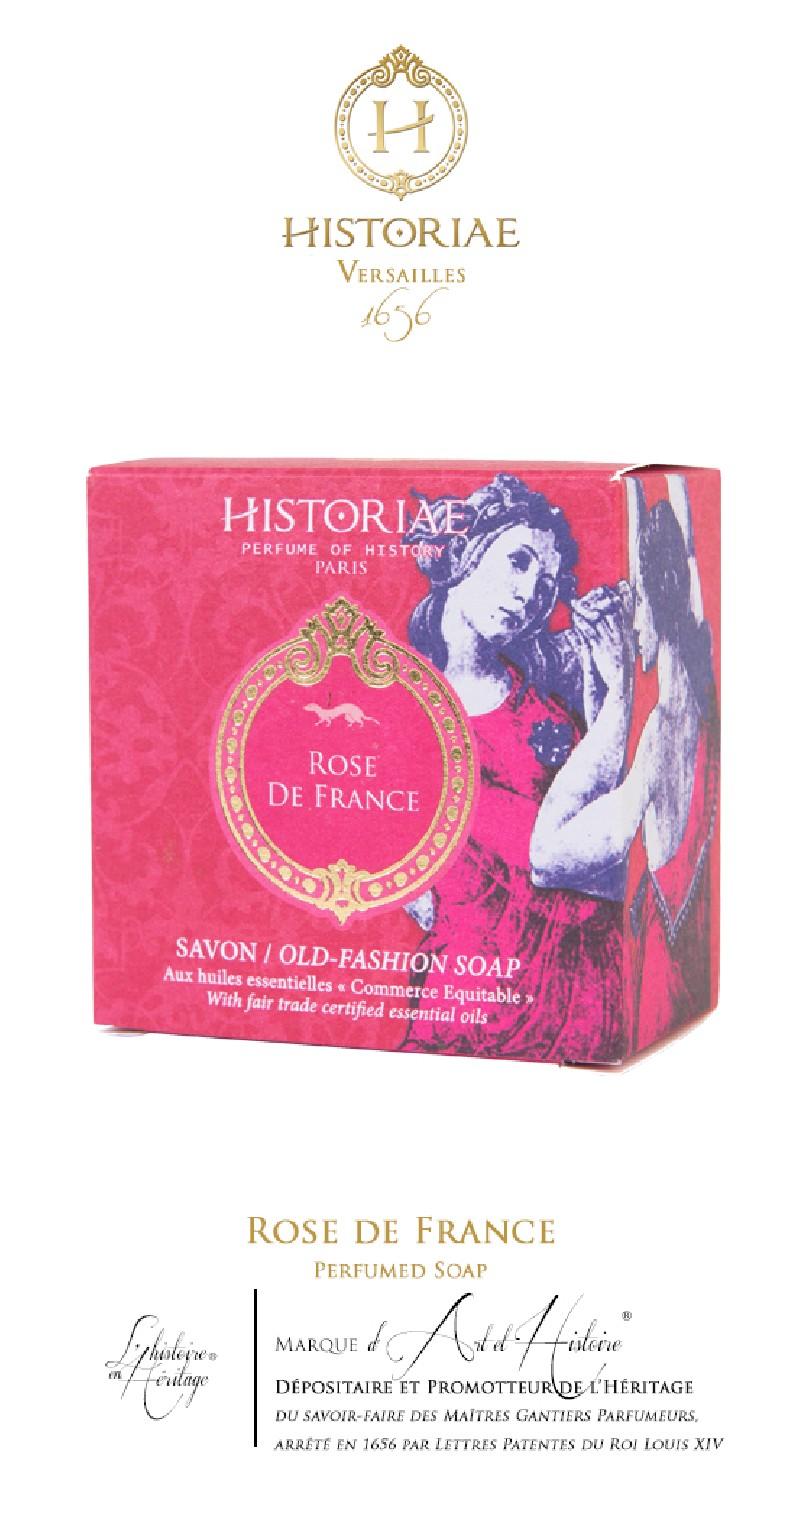 Rose de France - Perfumed Soap